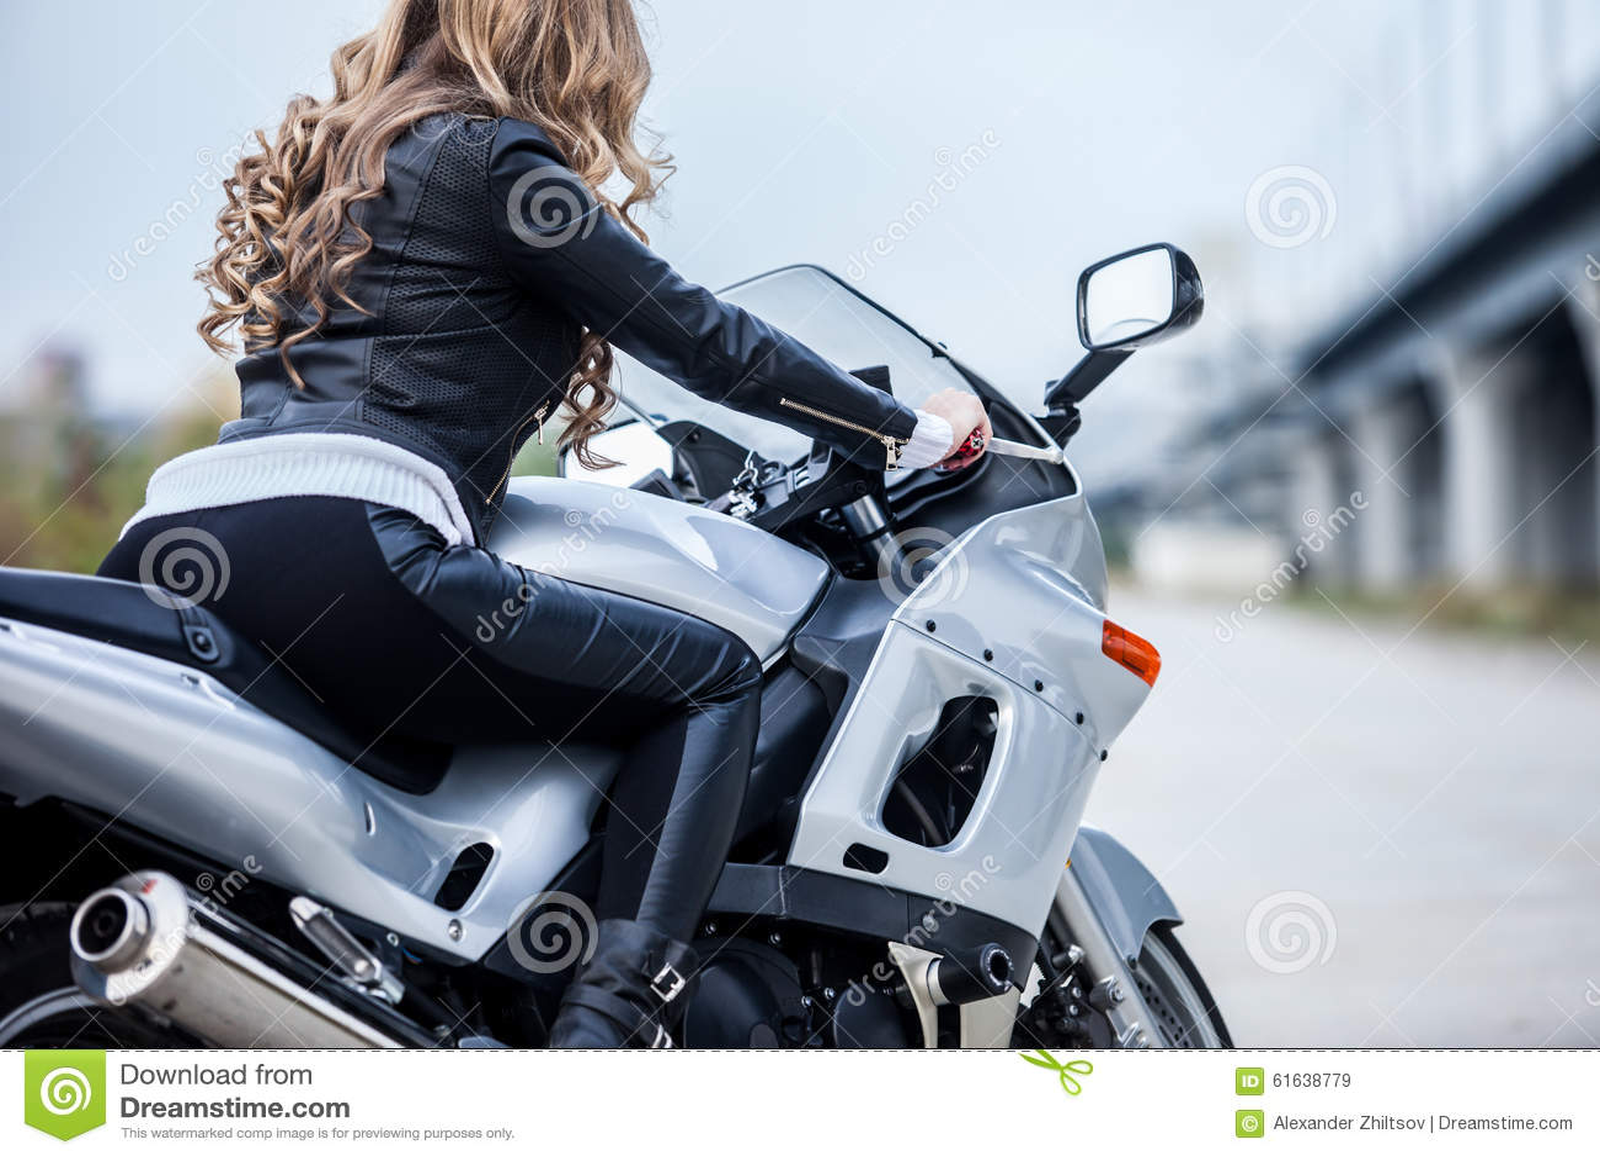 Auf motorrad frau BILD Logo